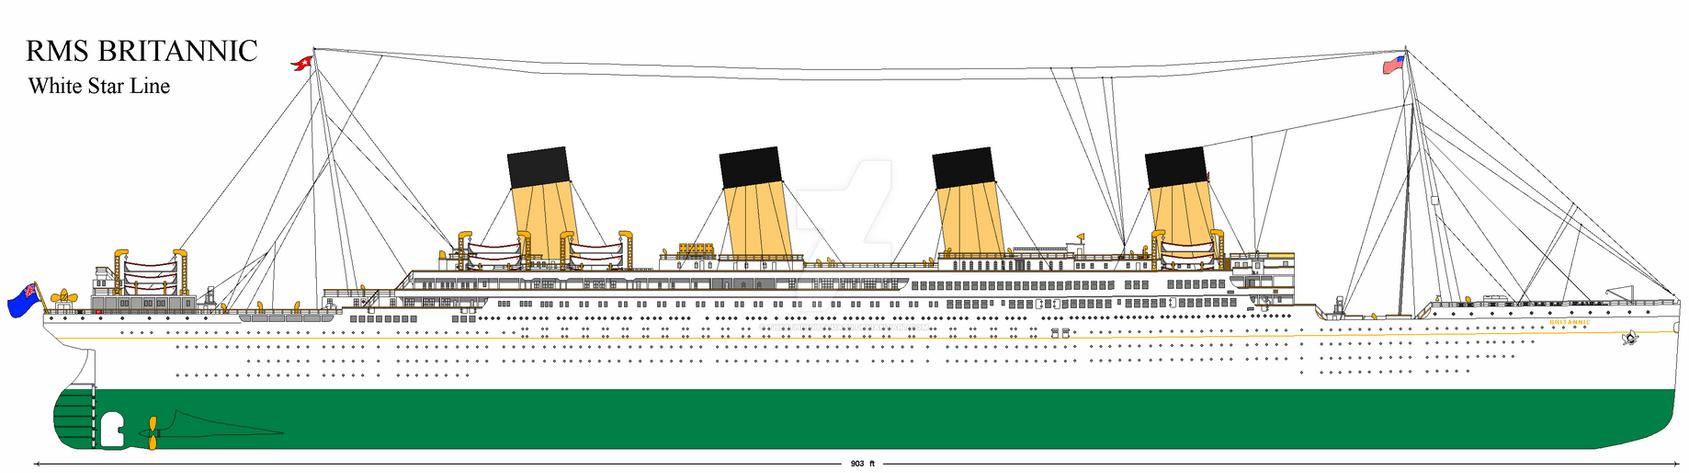 RMS Britannic 1930s AU by p51cmustang